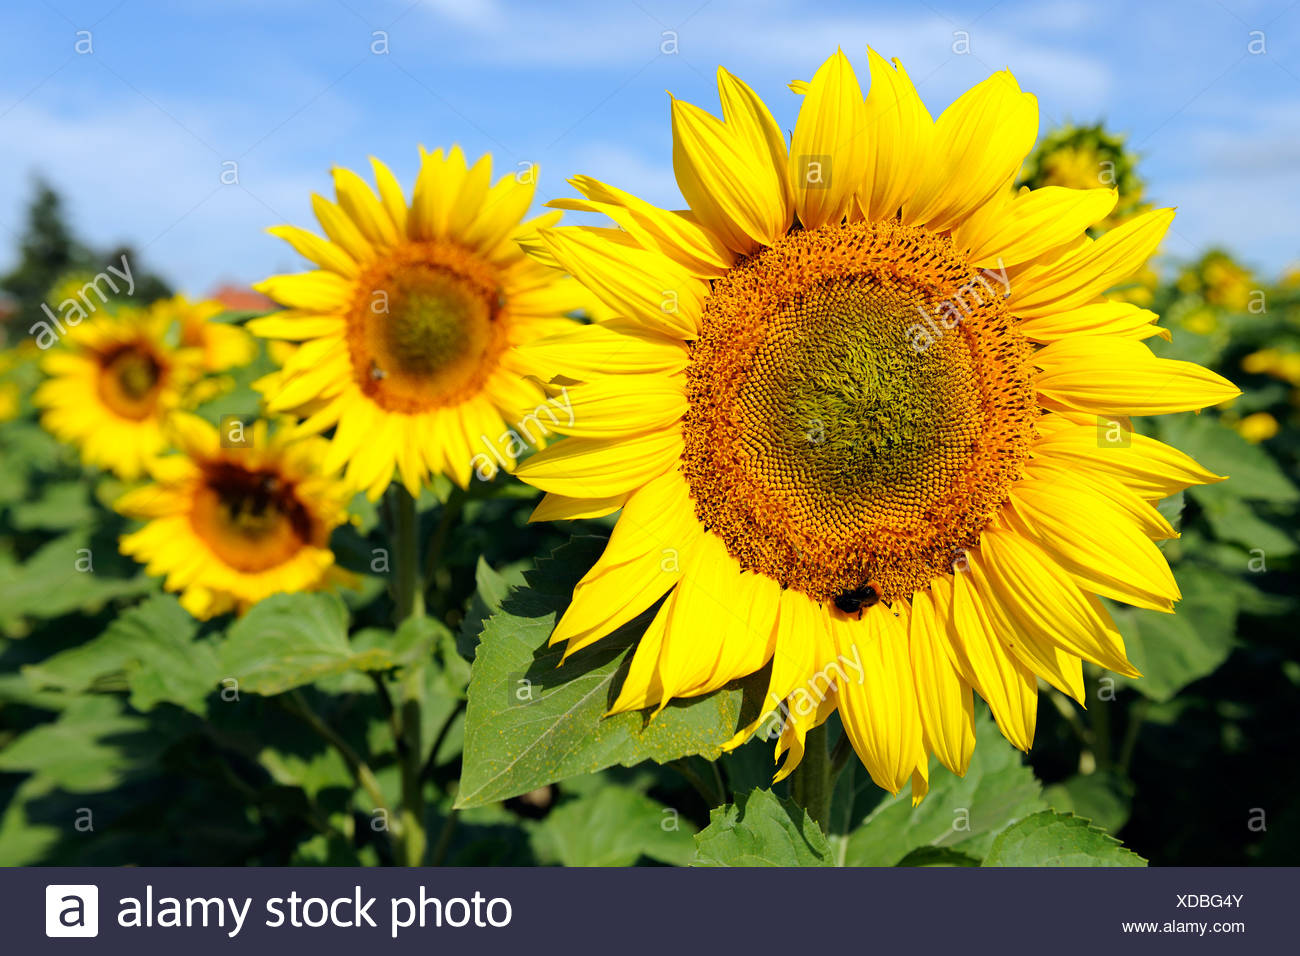 Sunflowers (Helianthus annuus) - Stock Image